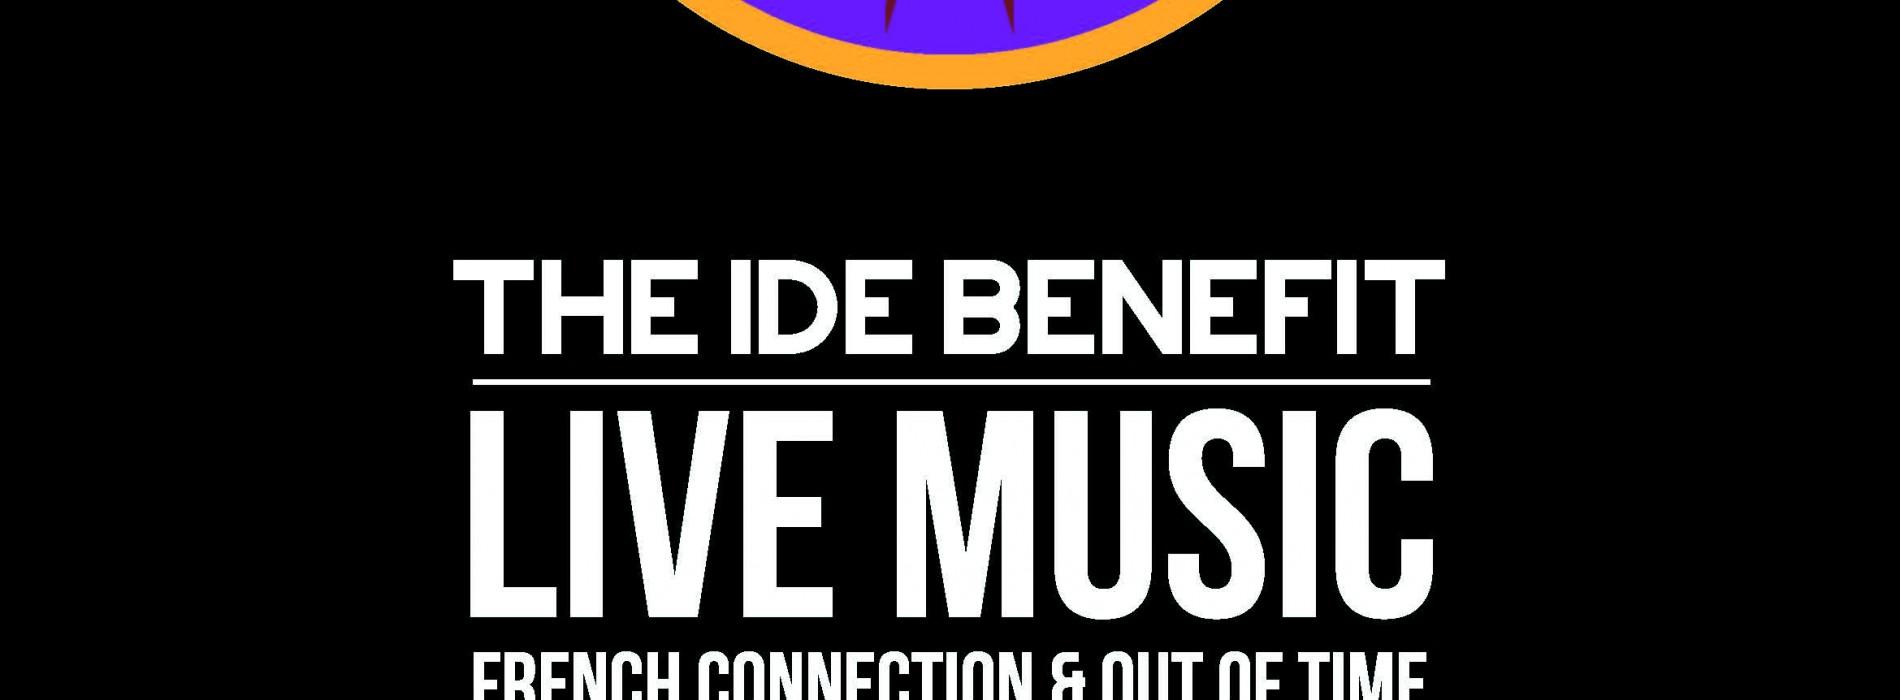 The IDE Benefit Concert